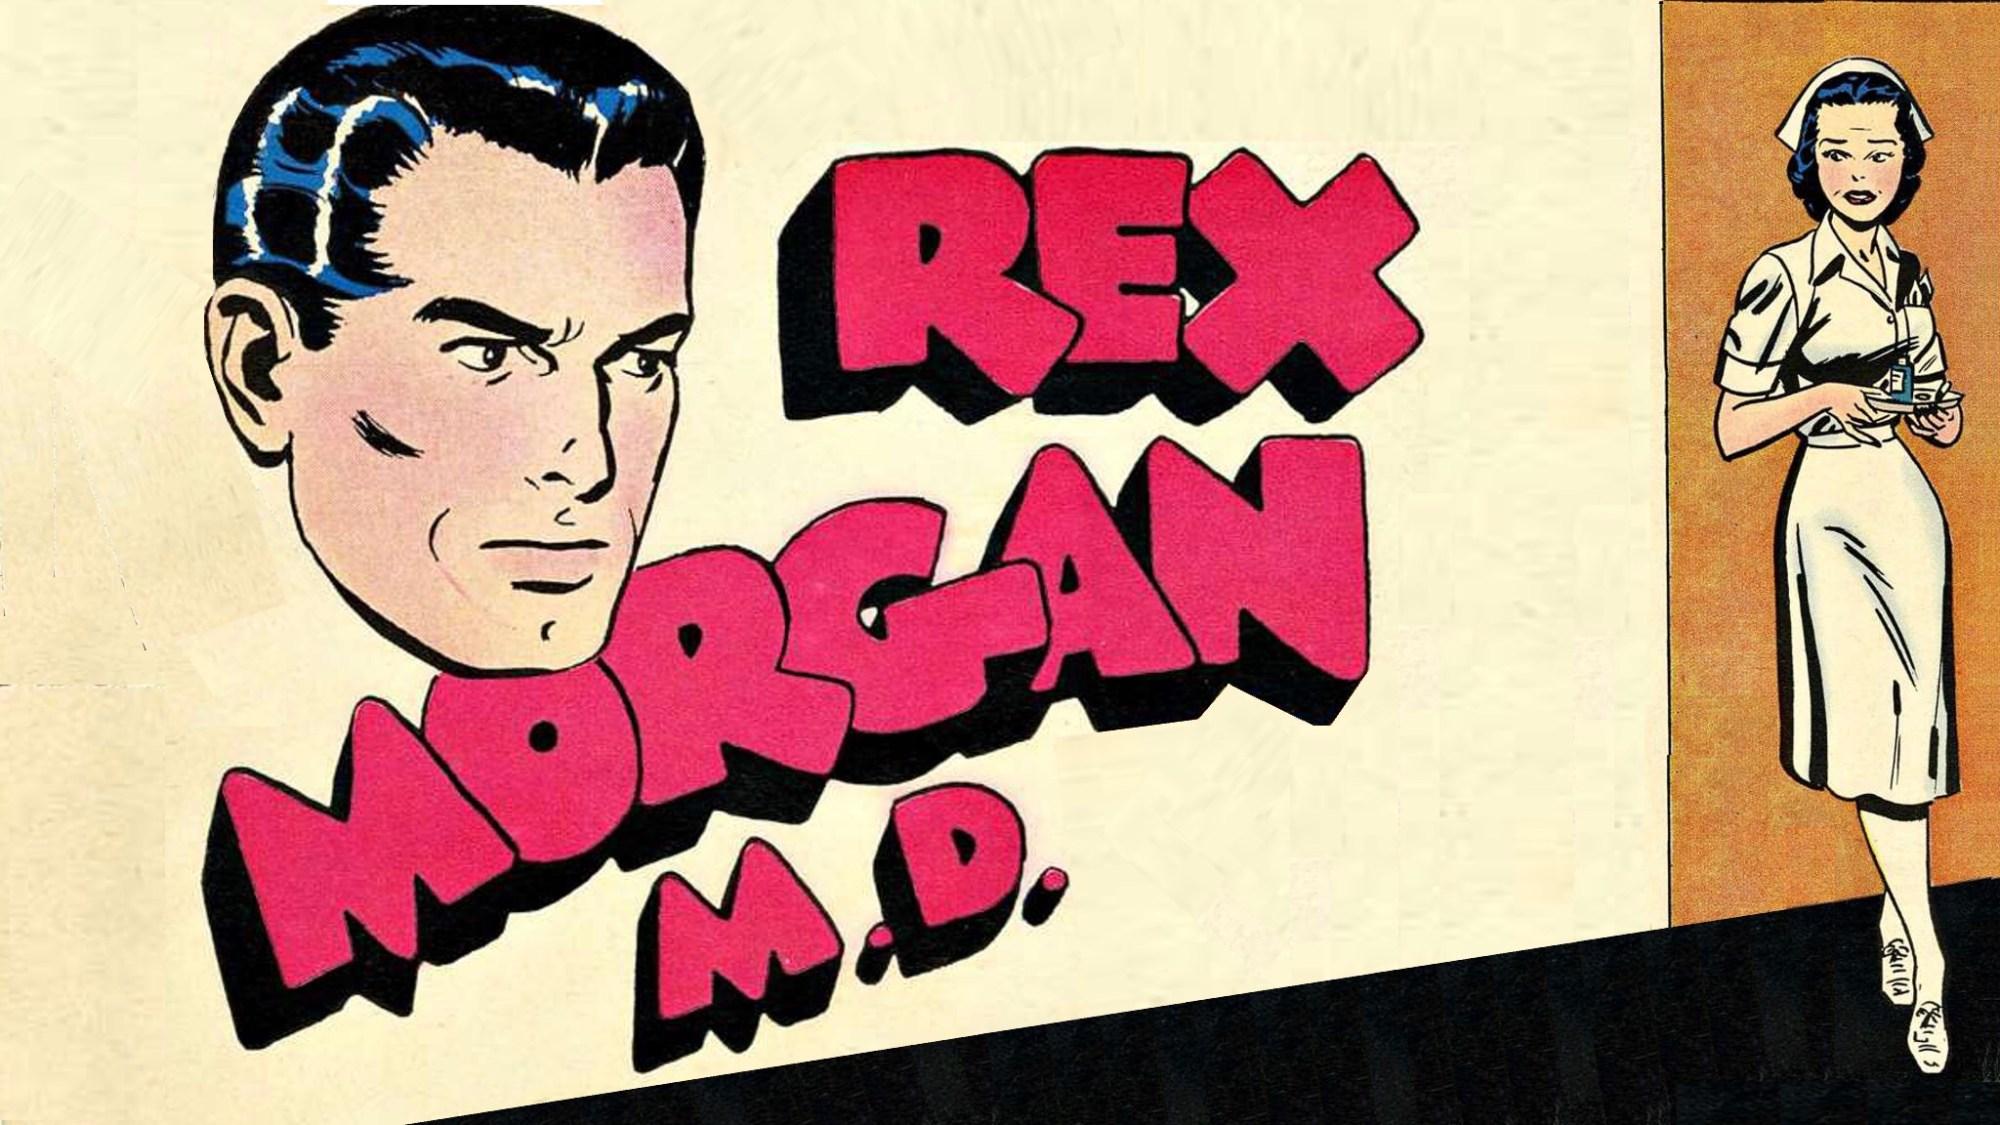 Rex Morton (Rex Morgan M.D.)